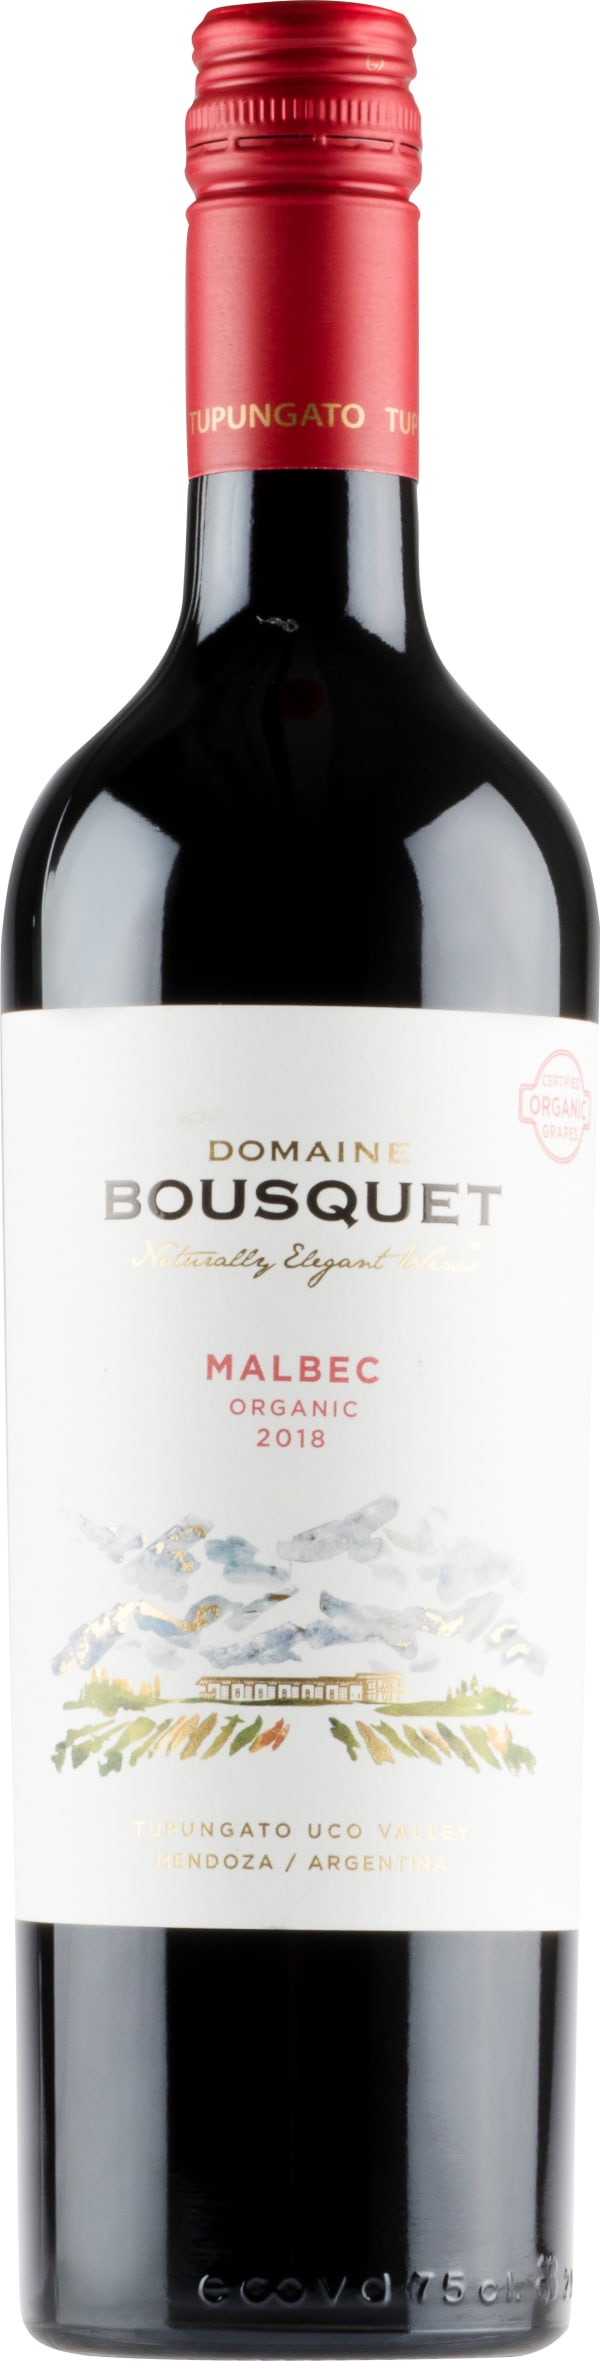 Domaine Bousquet Malbec Organic 2017